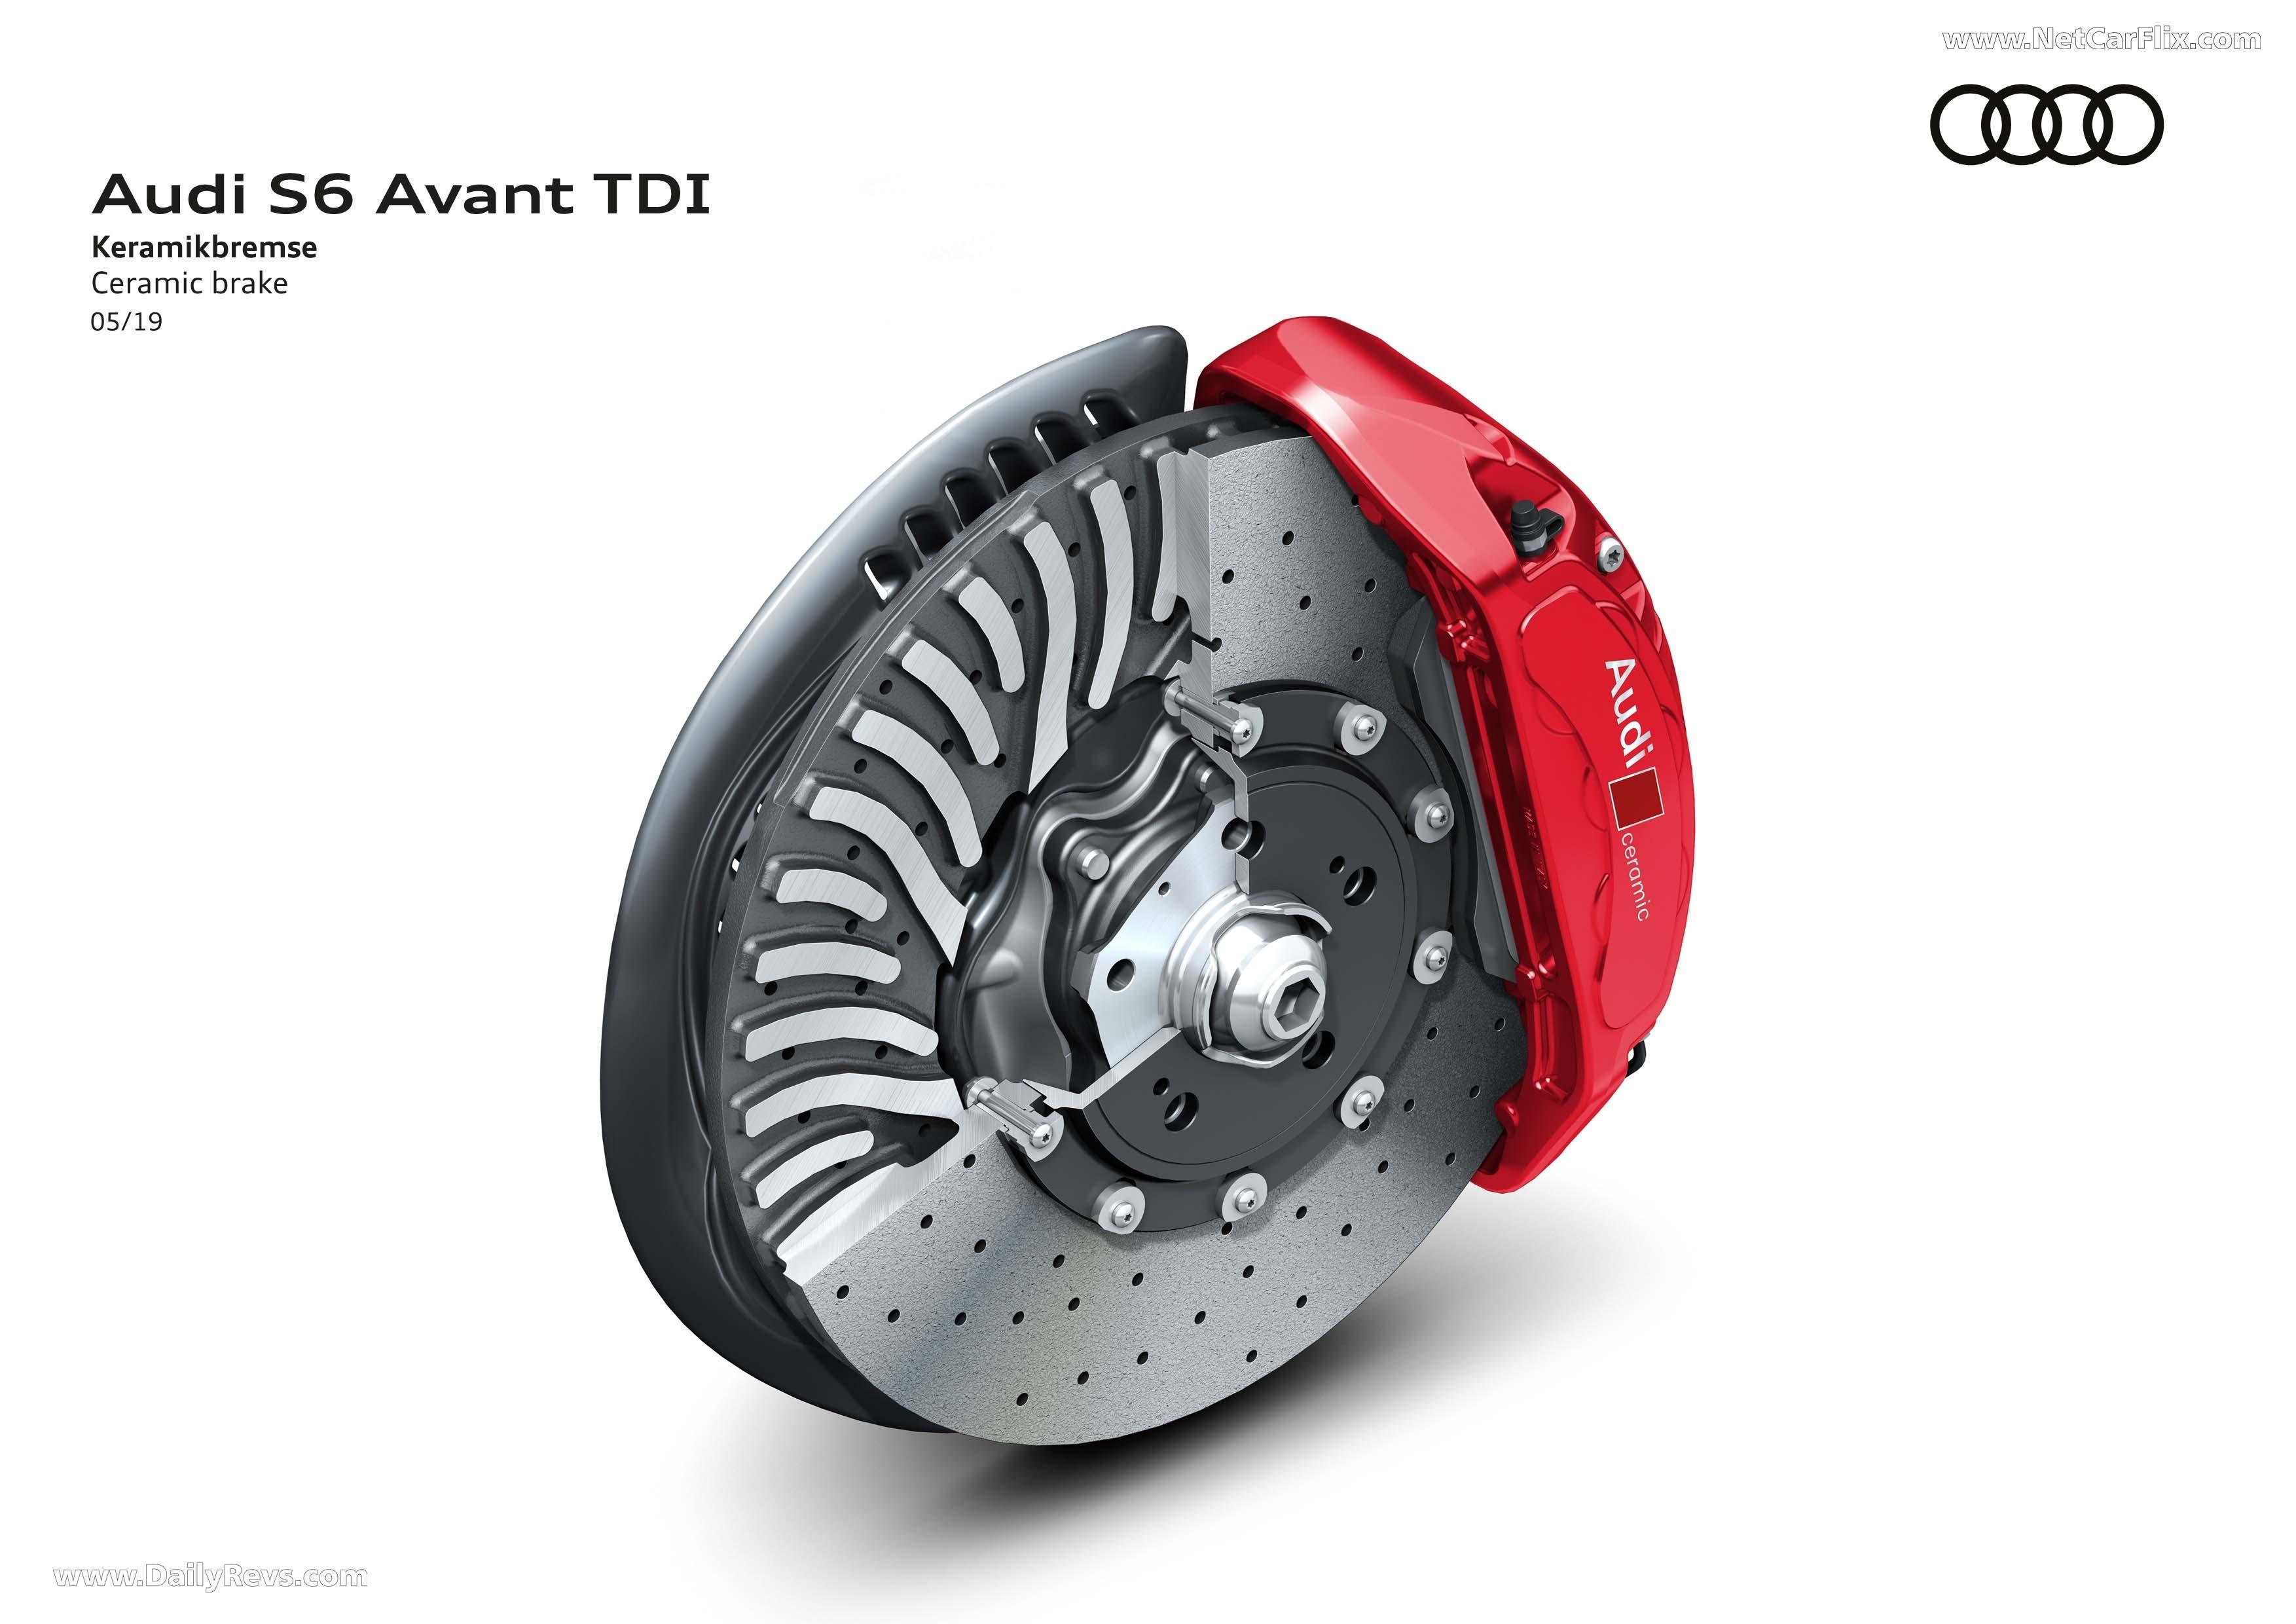 2020 Audi S6 Avant TDI full